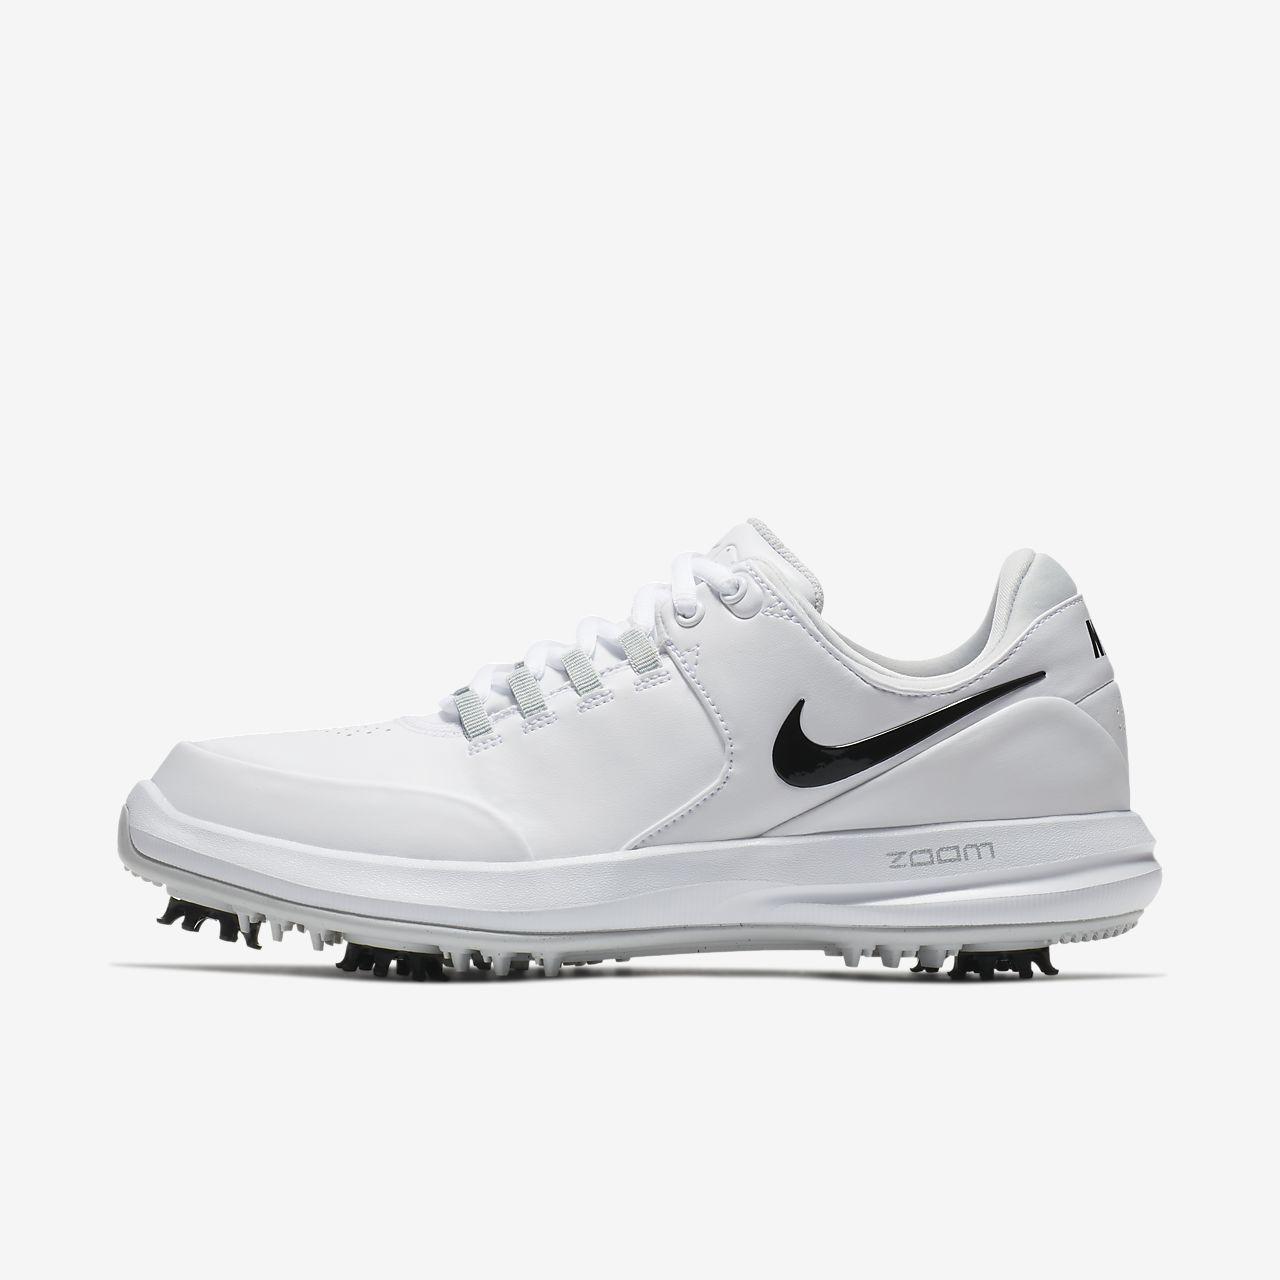 a87a112f Nike Air Zoom Accurate Women's Golf Shoe